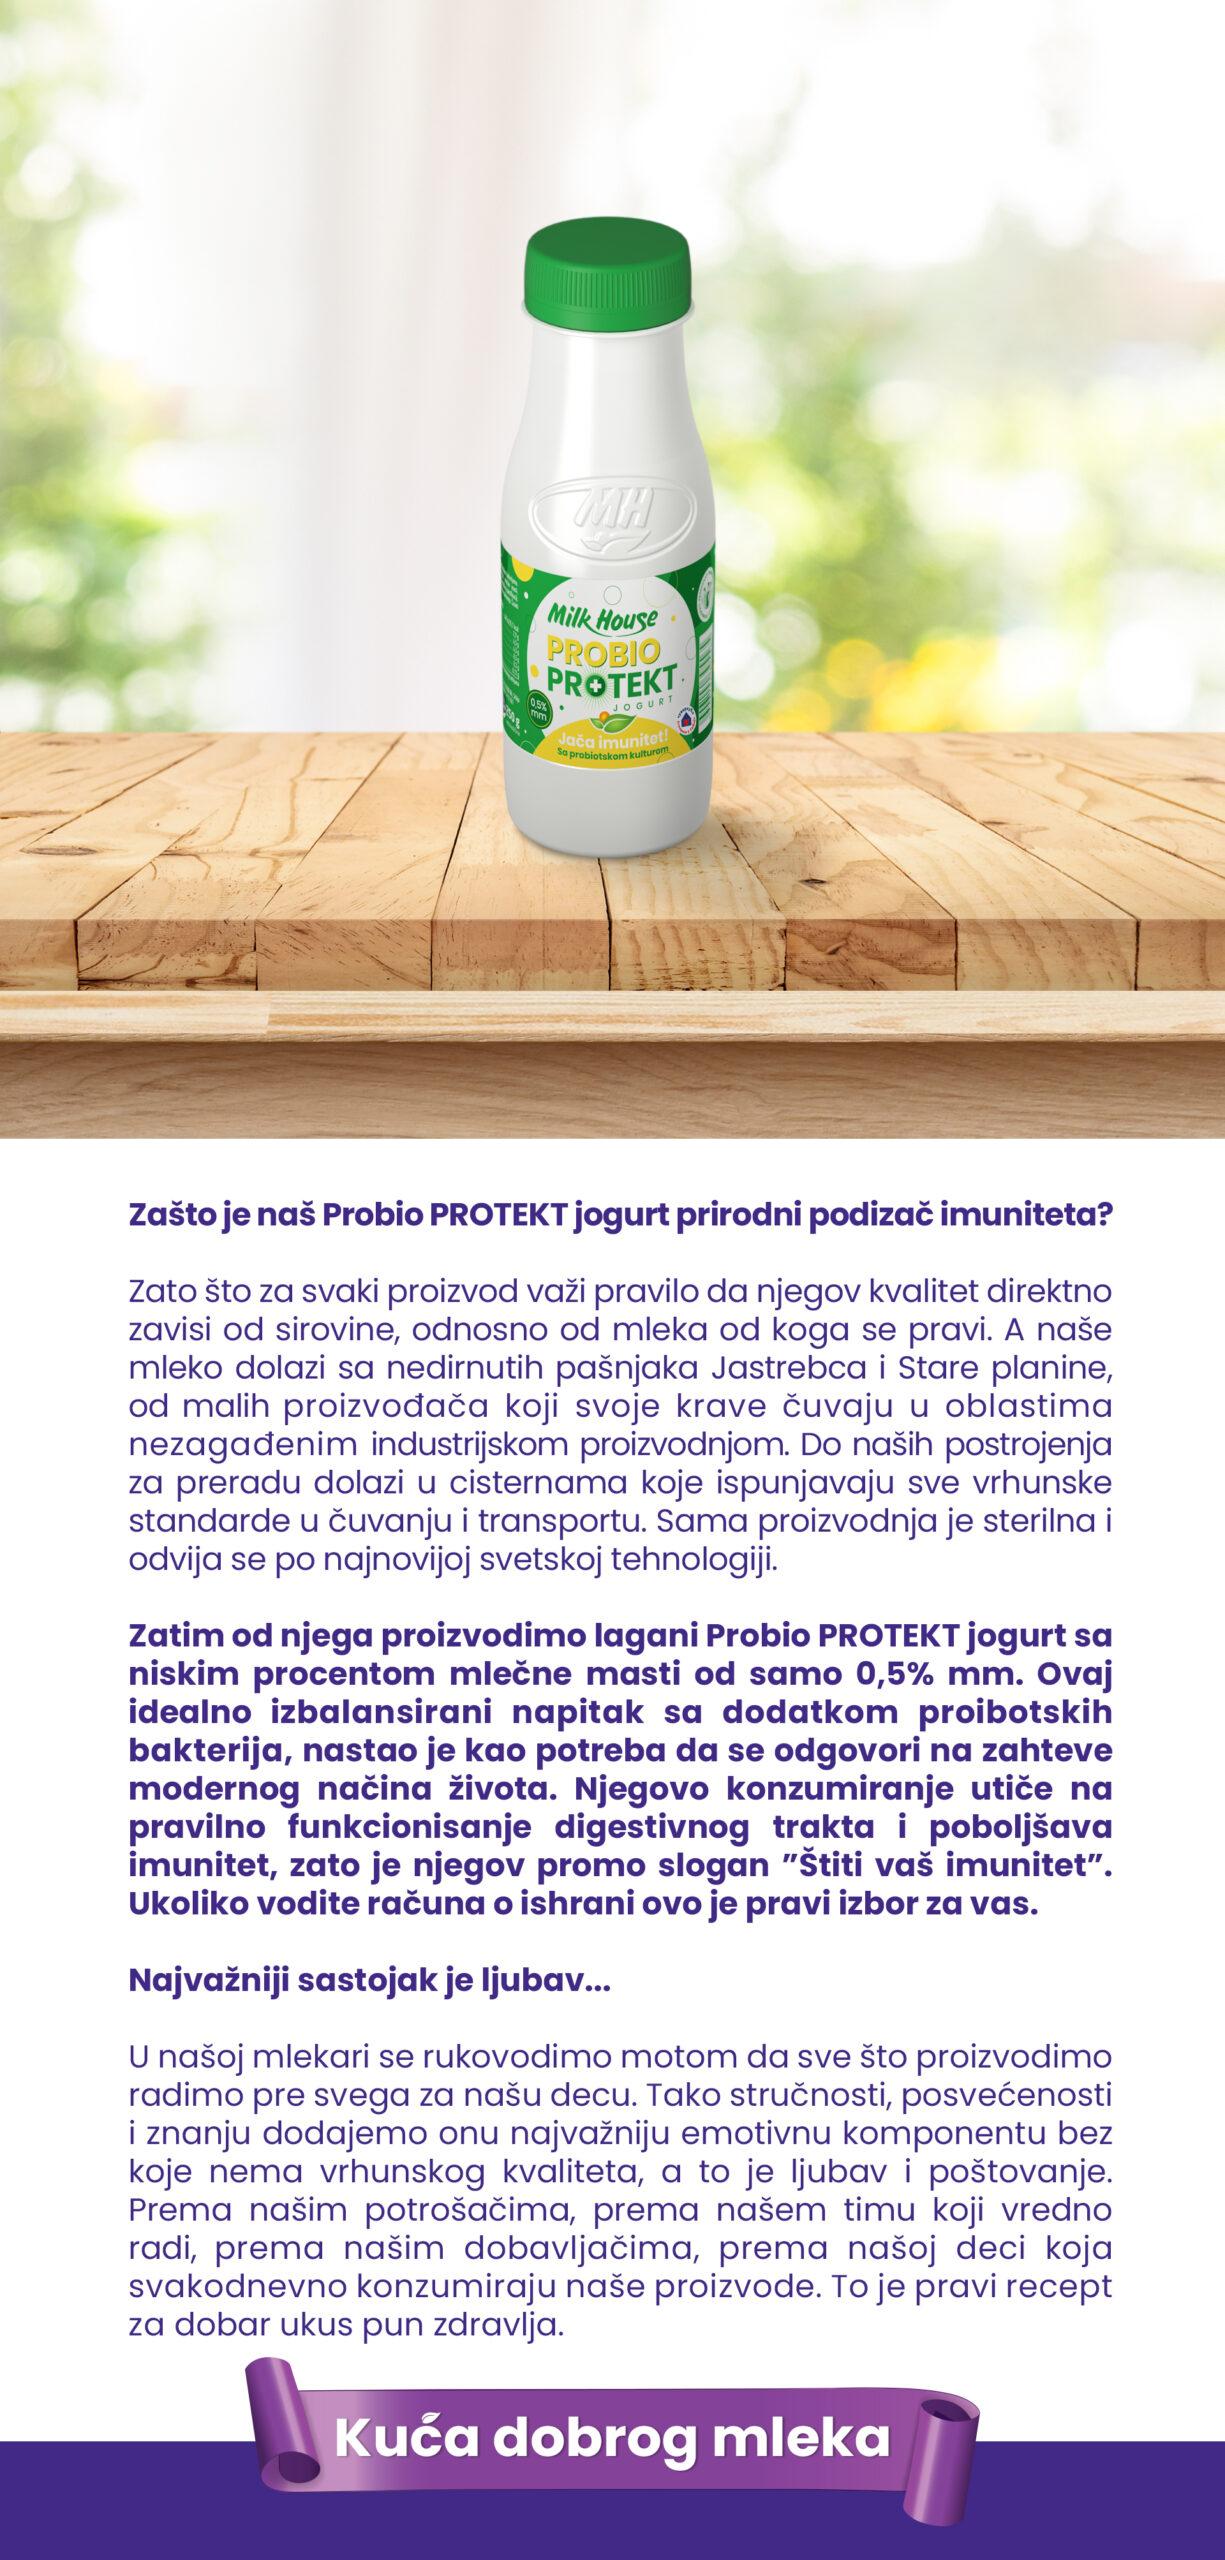 ProBio Protekt jogurt